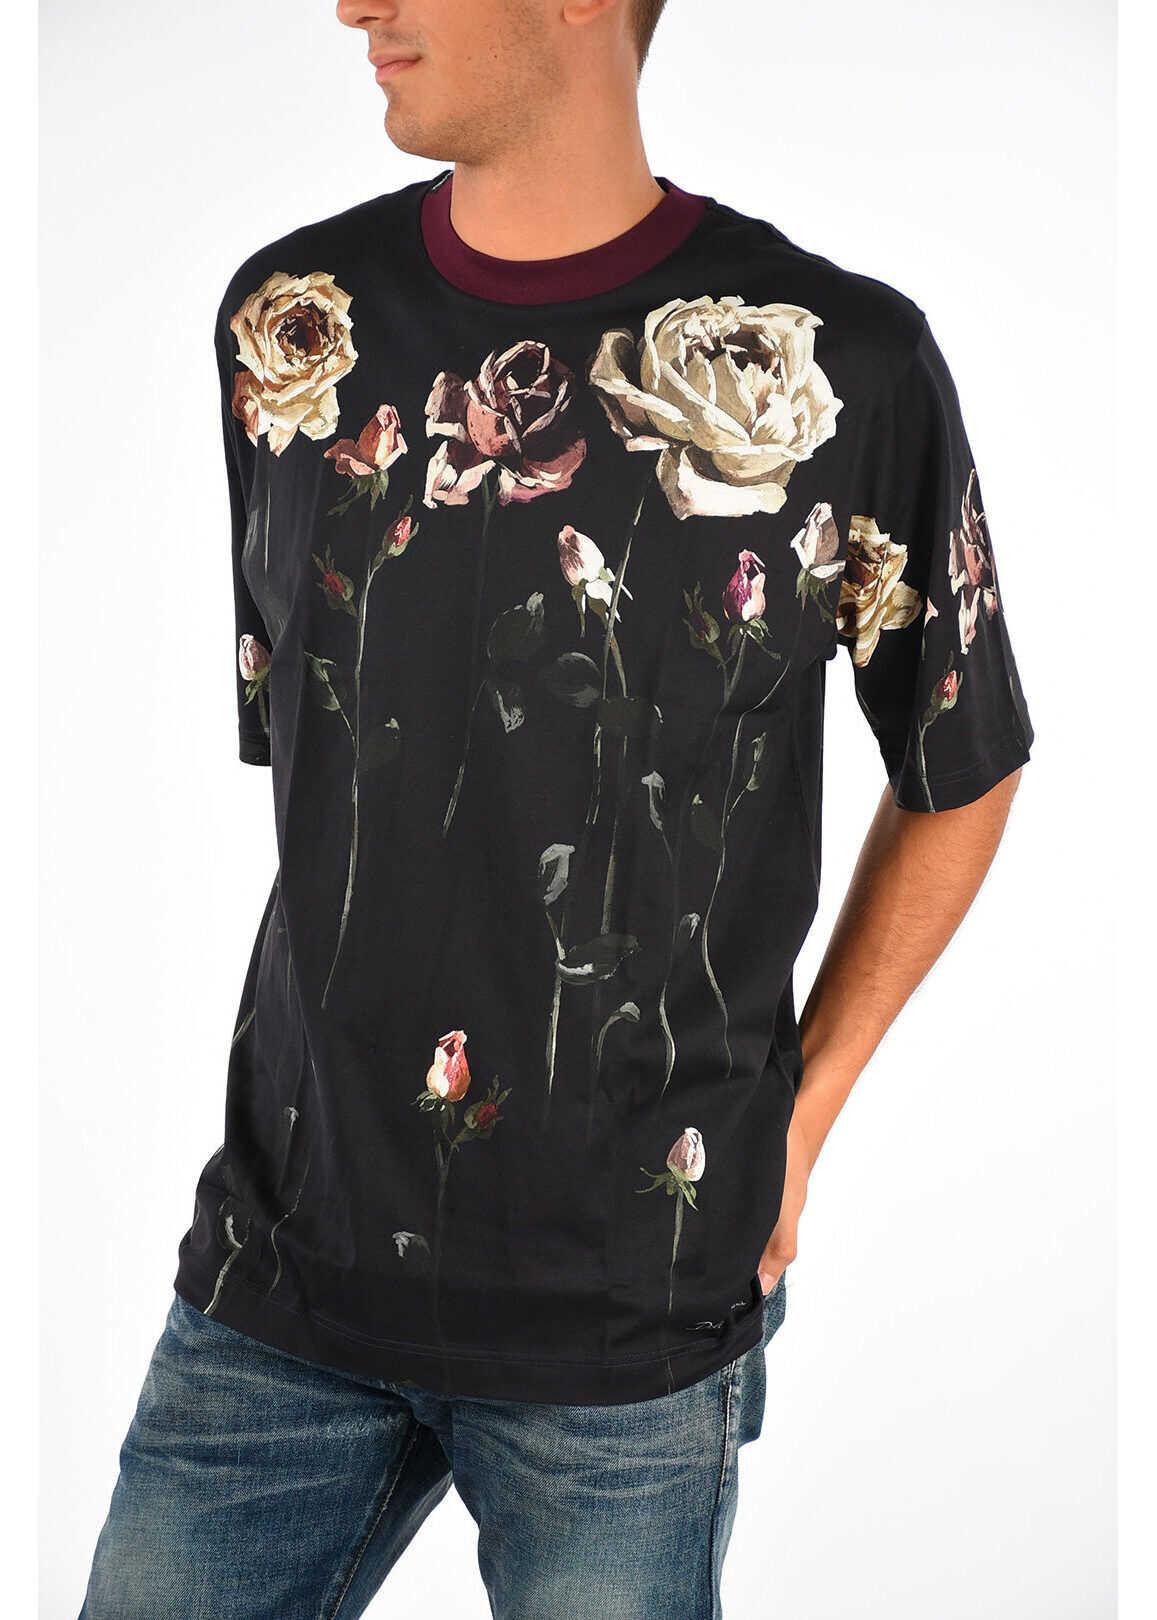 Printed Flowers T-Shirt